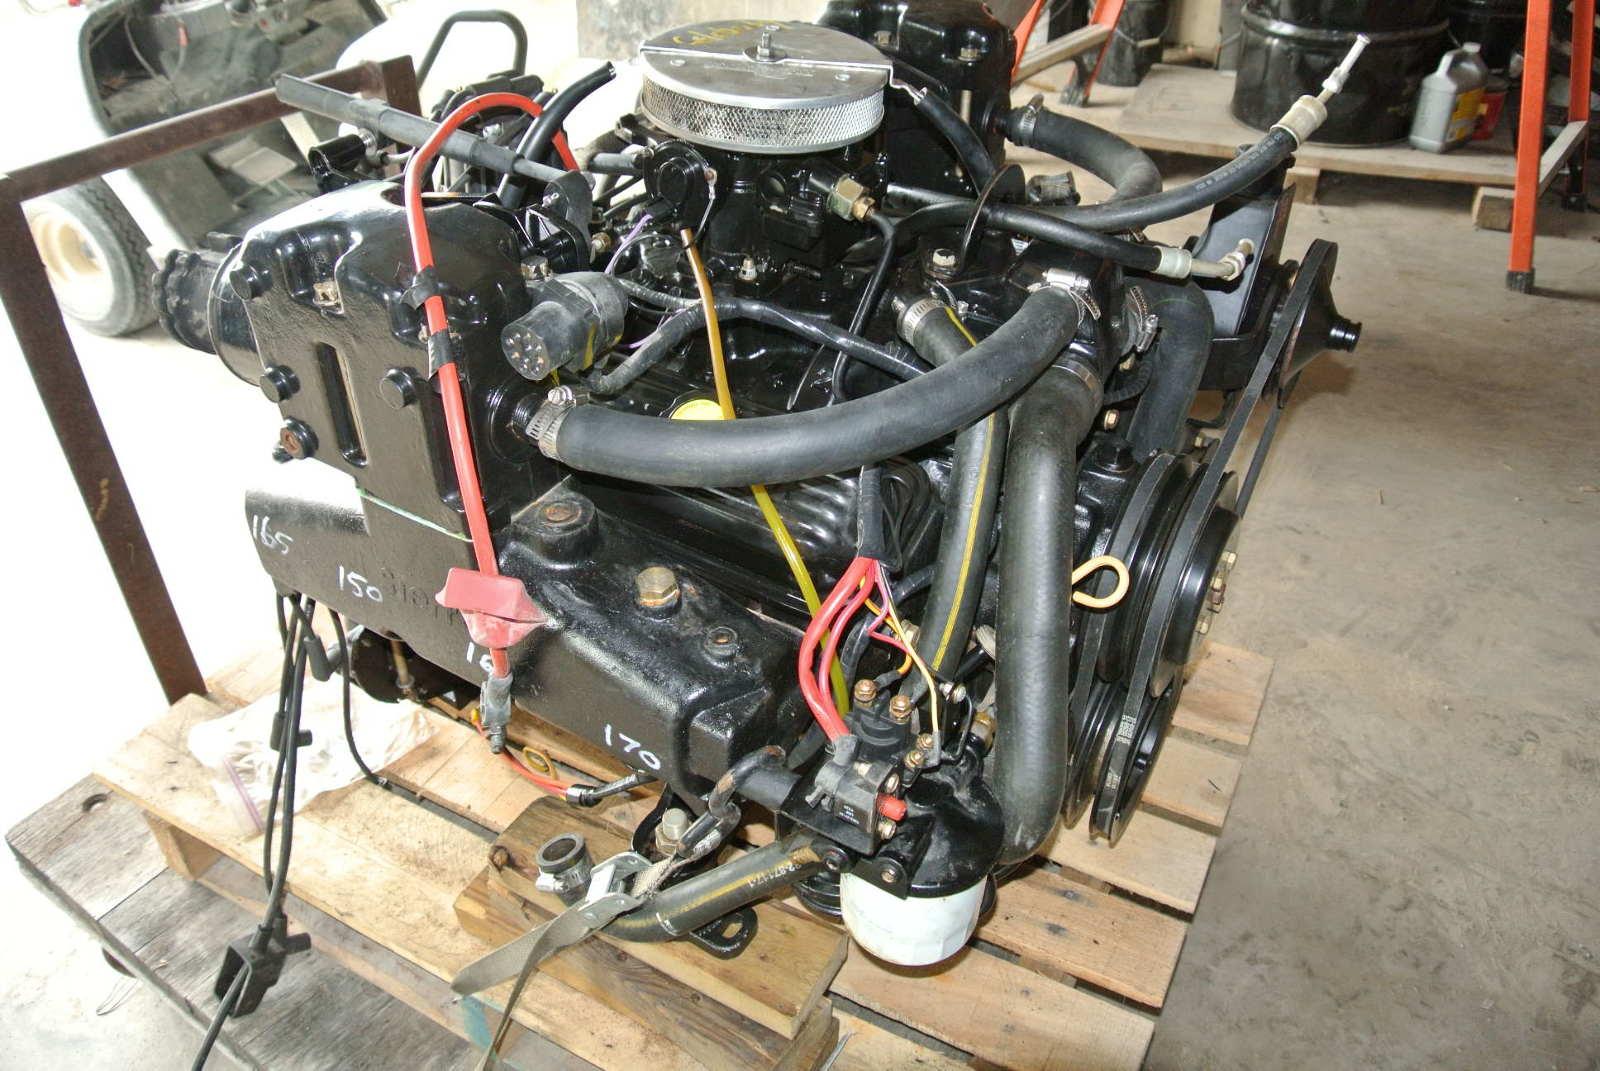 mercruiser wiring diagram 5 0 2005 dodge stratus engine outdrive water pump free